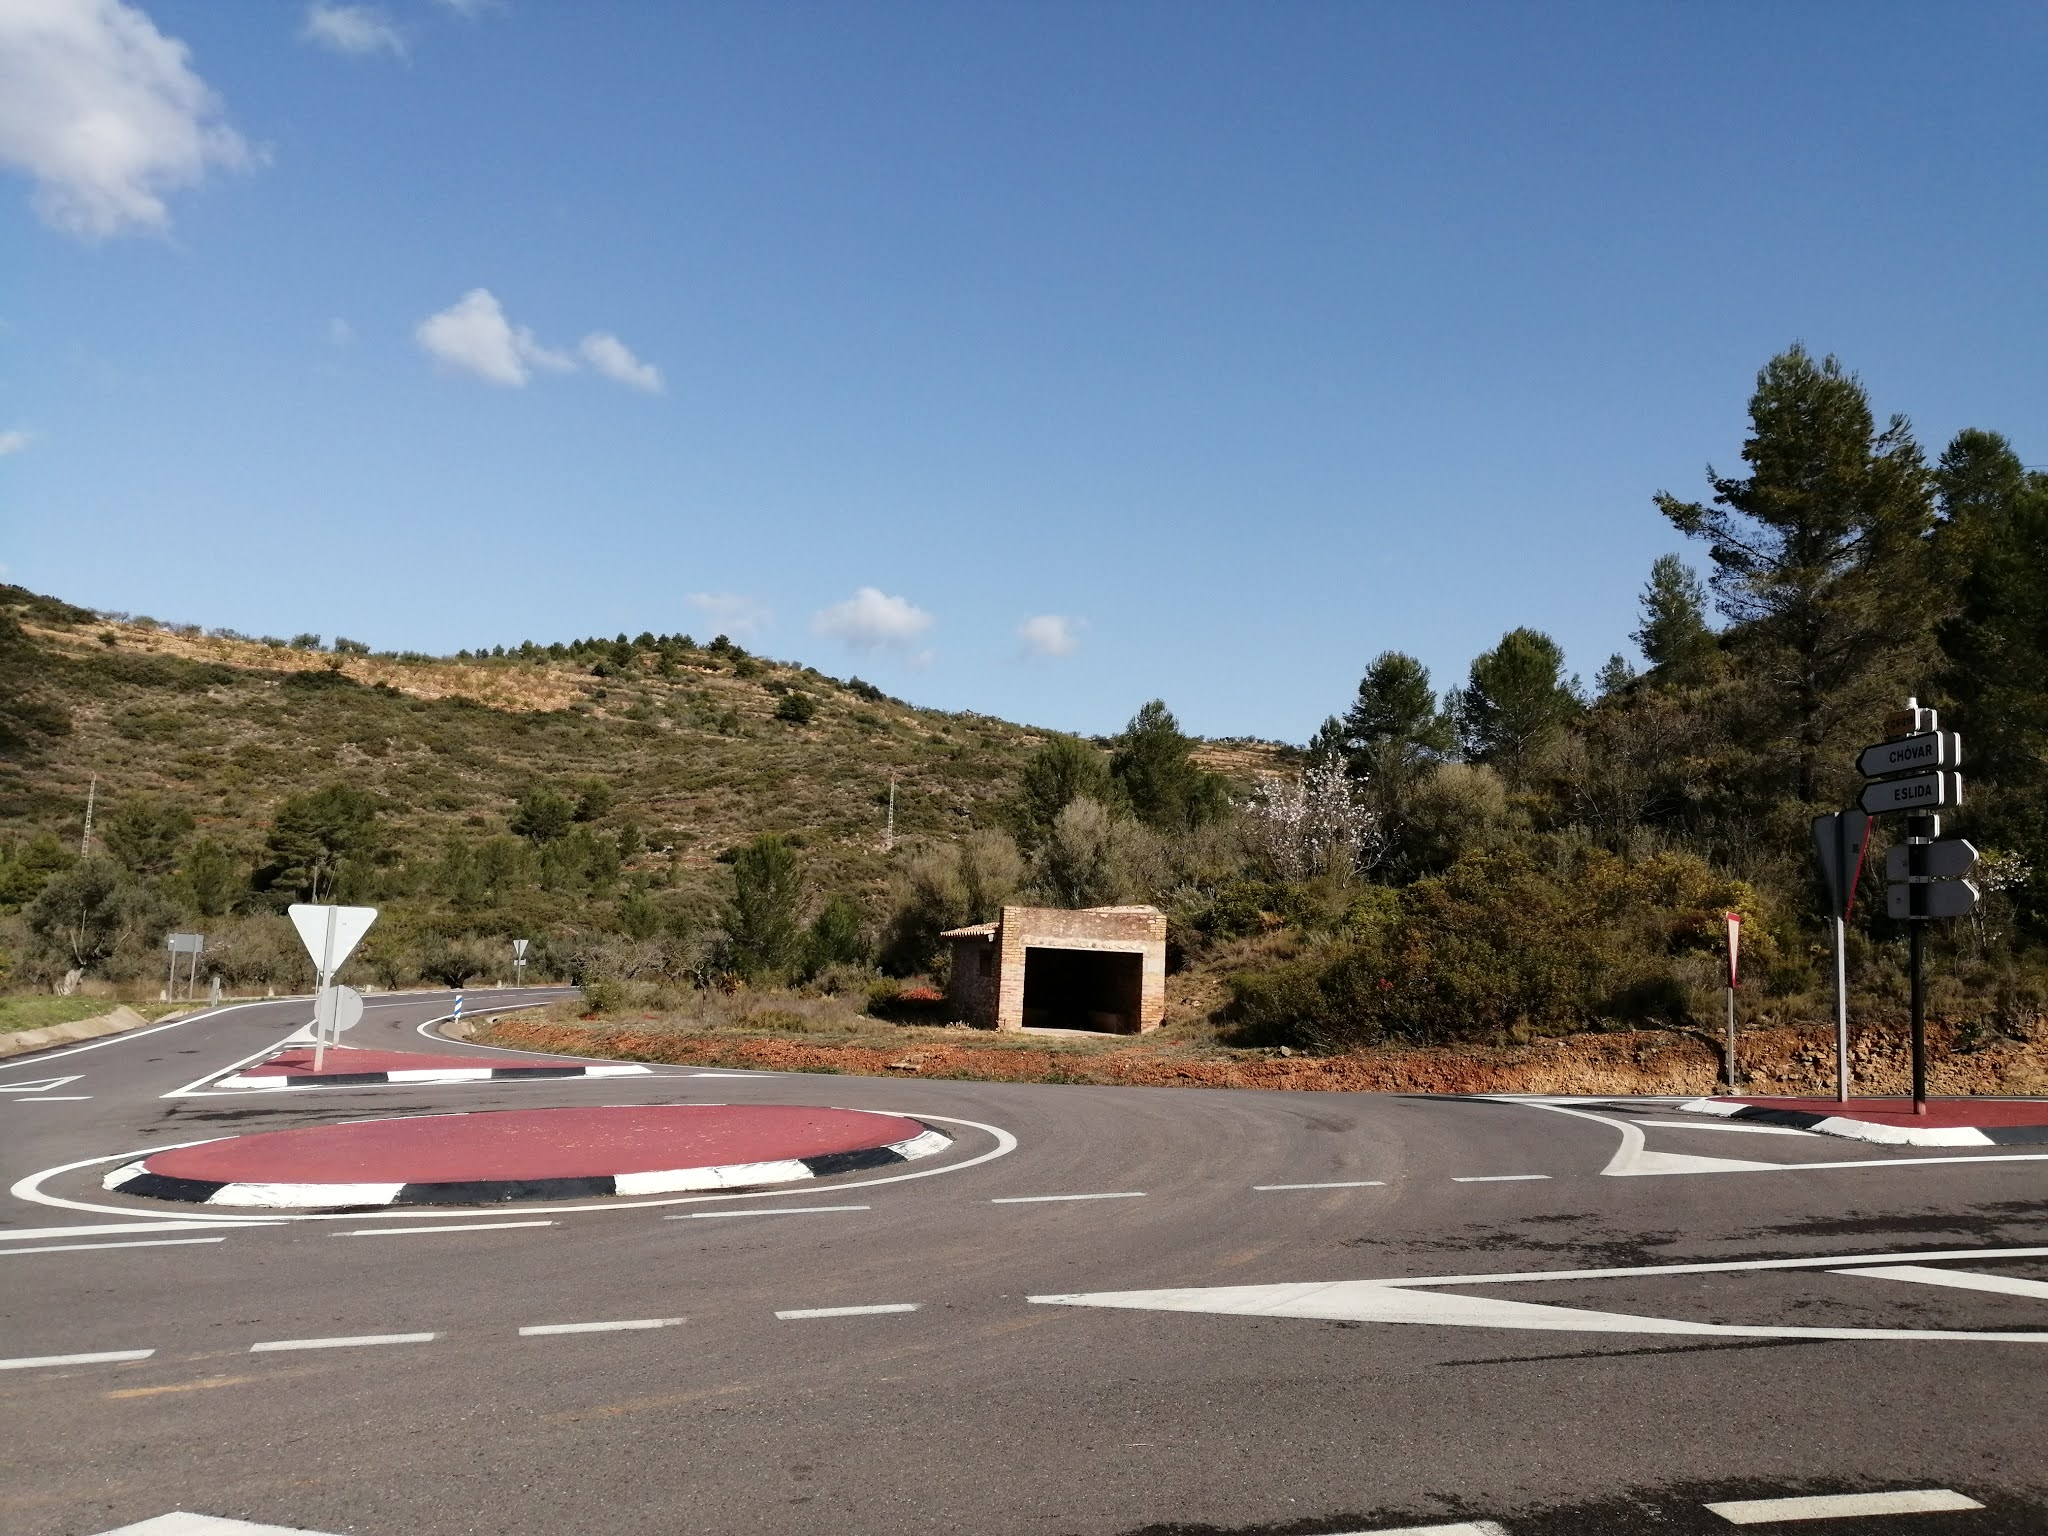 Junction of the CV-230 Vall d'Uxo-Soneja and CV-219 roads in Castellón